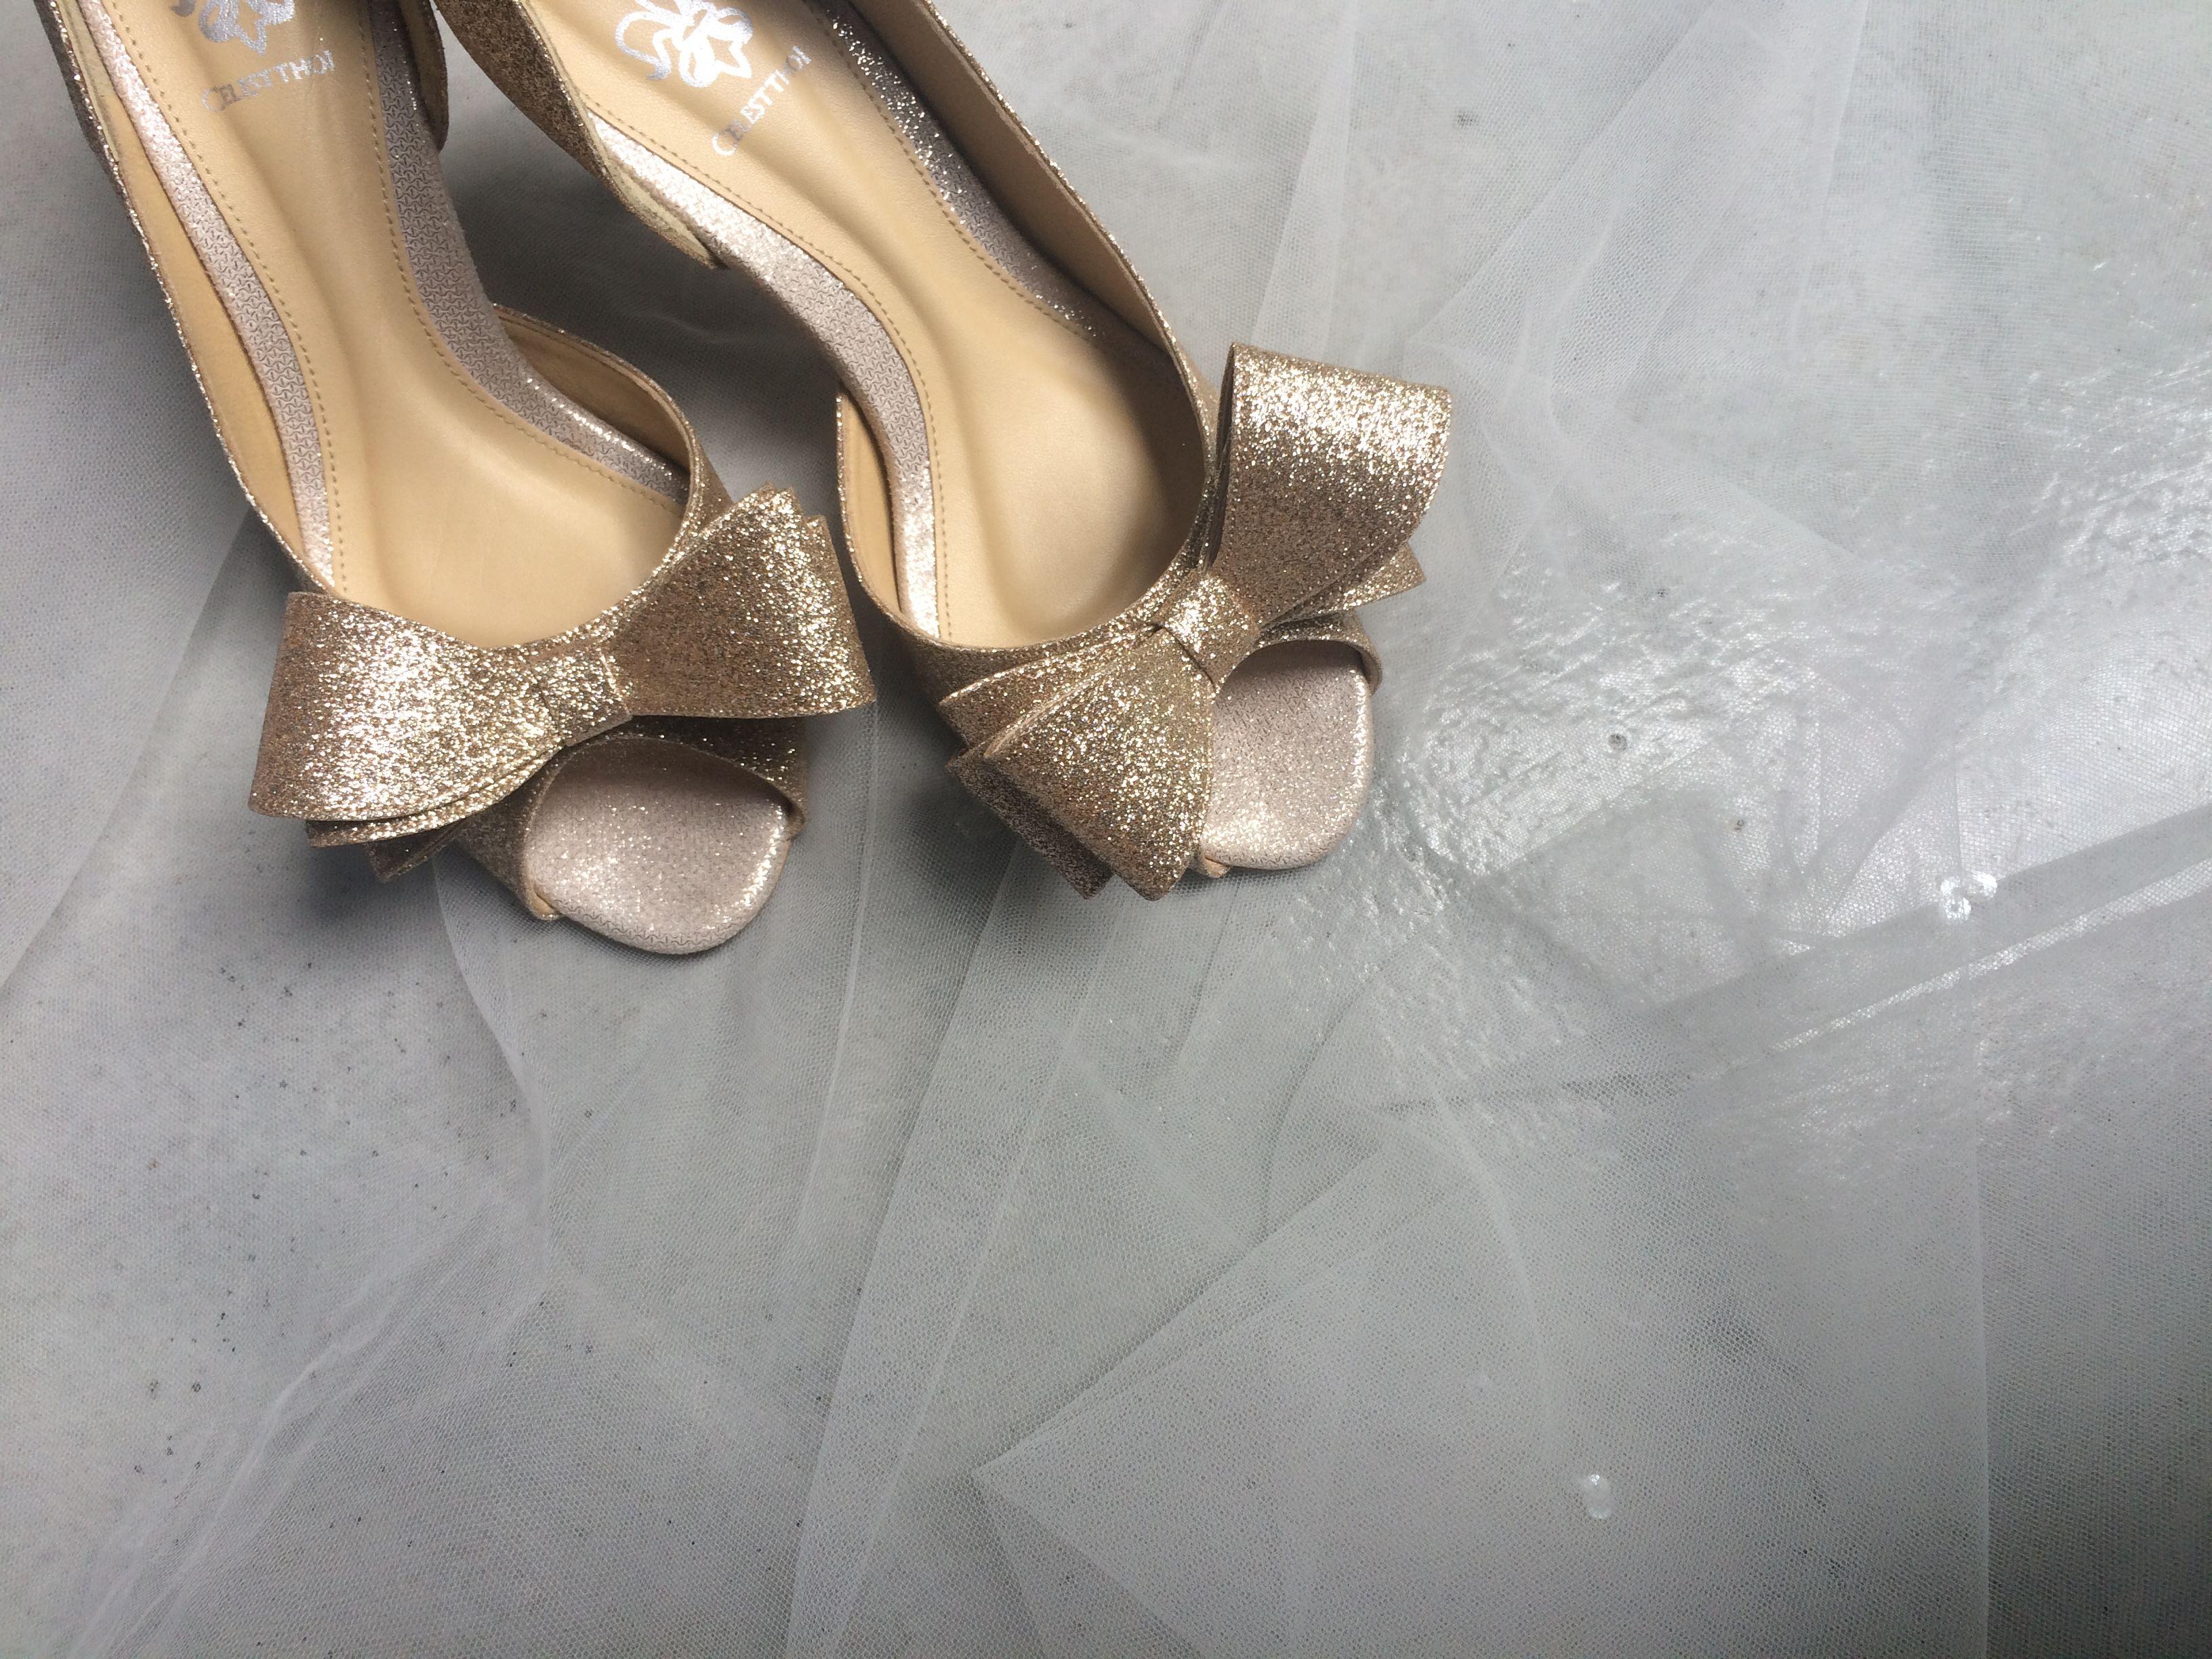 Celest Thoi bespoke wedding shoes with glittered fabric